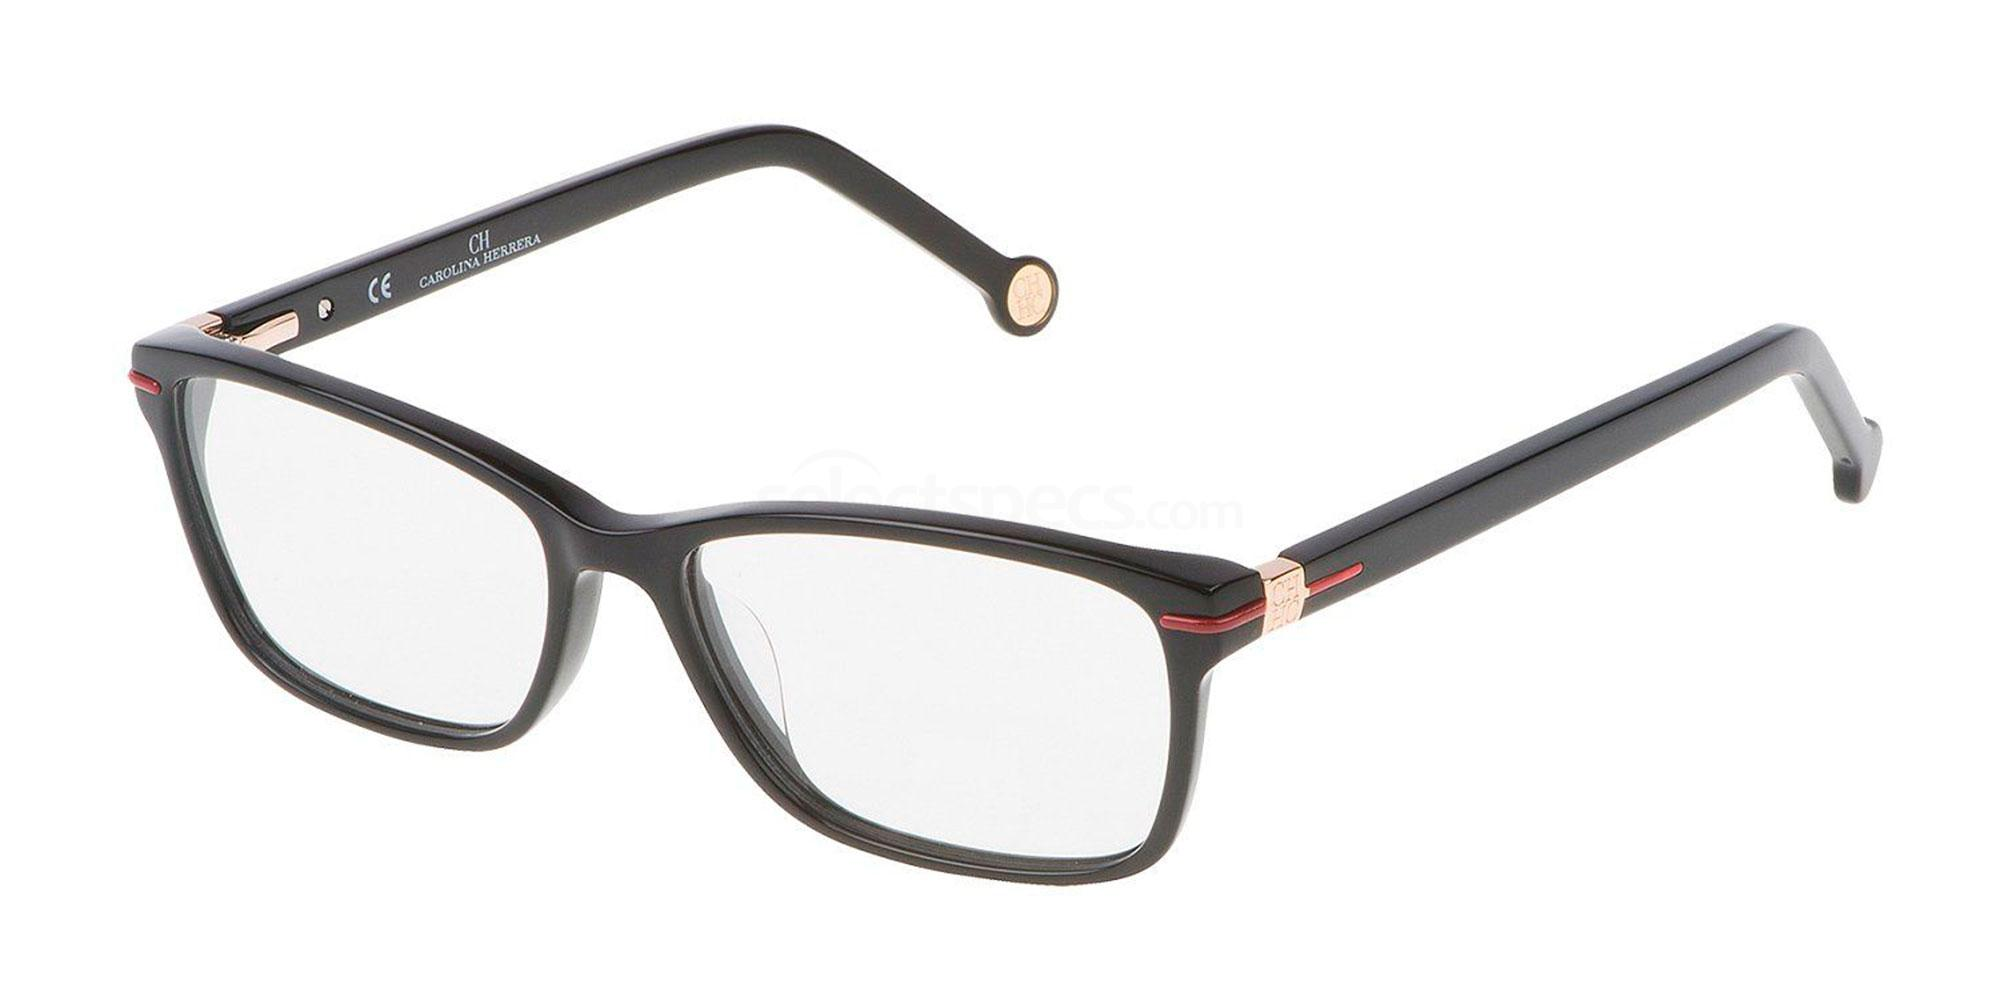 0700 VHE661 Glasses, CH Carolina Herrera